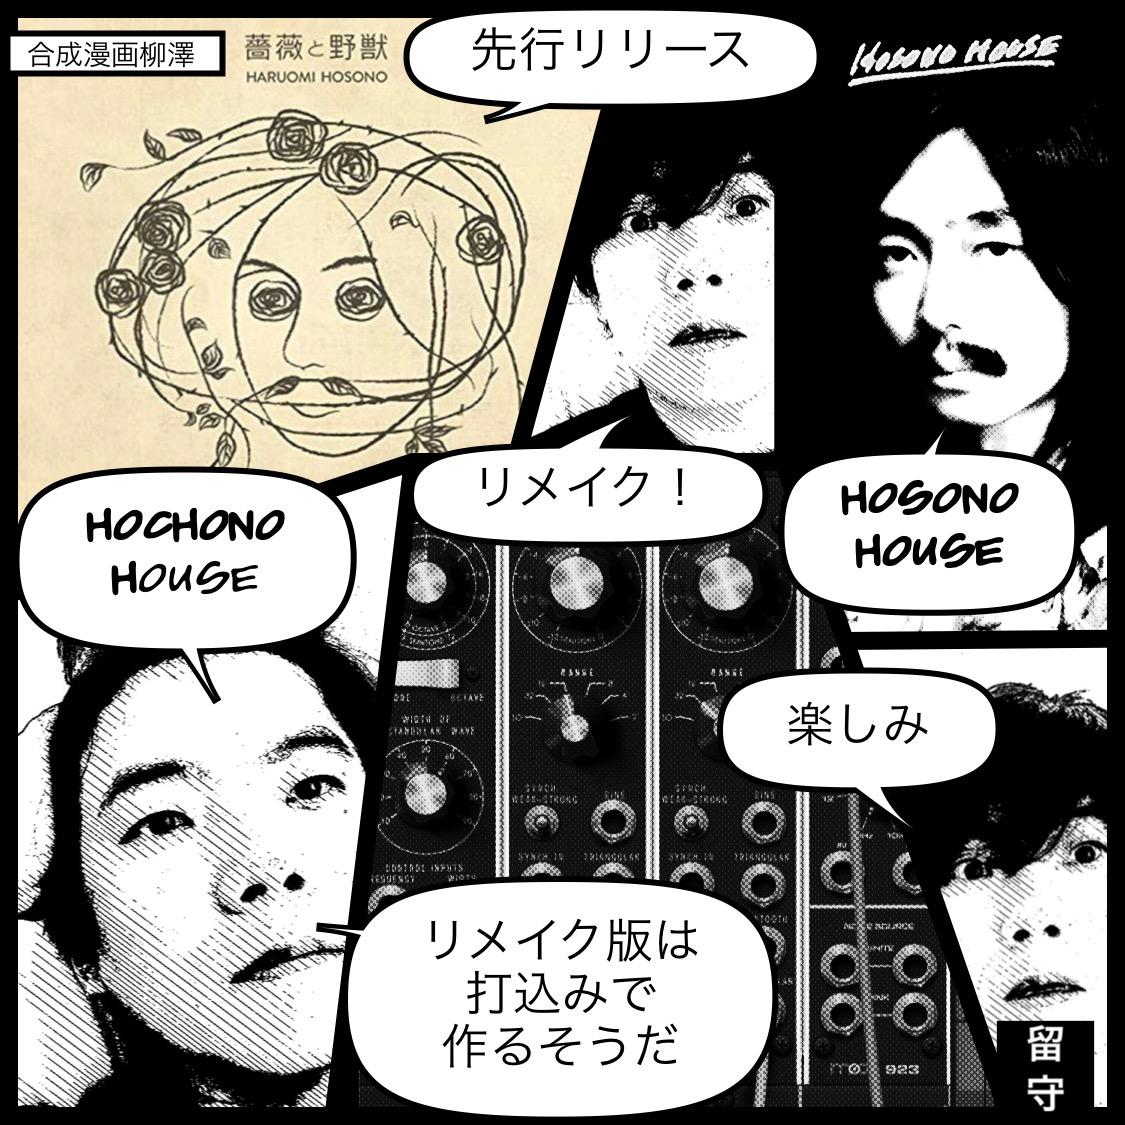 HOCHONO HOUSE